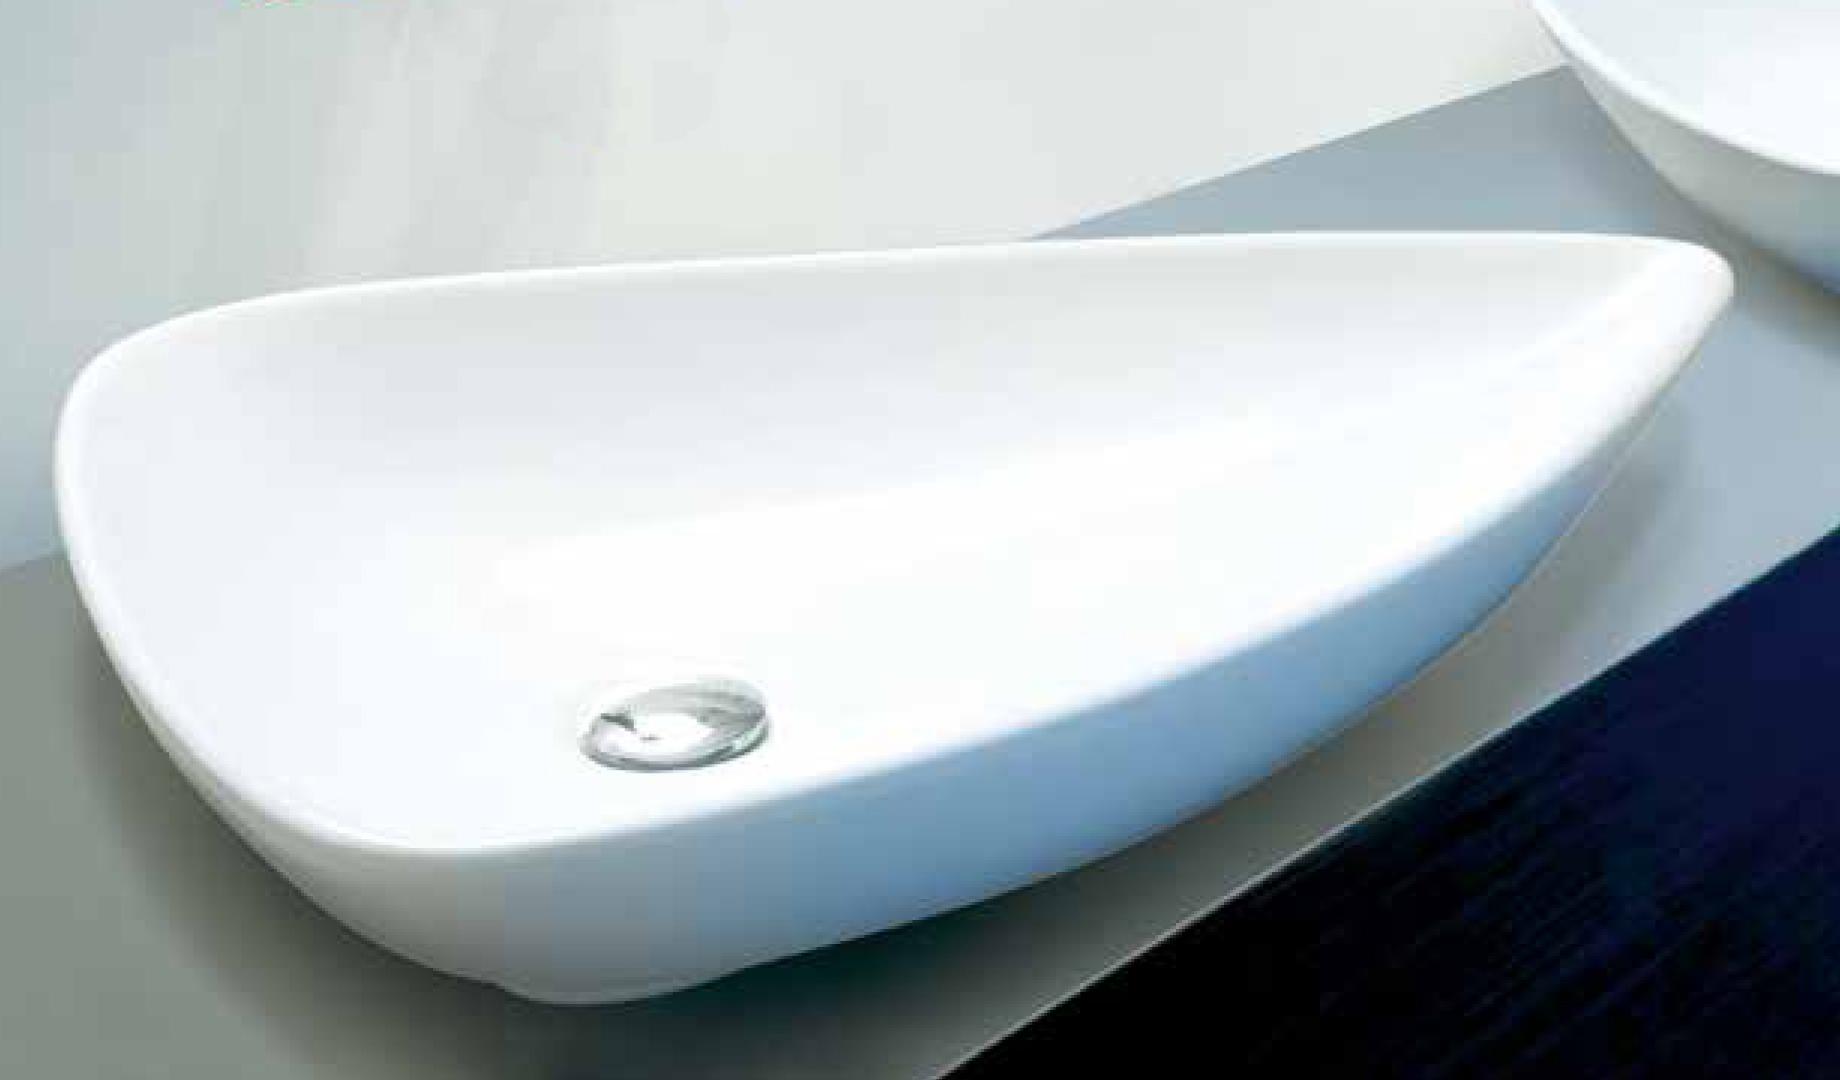 Aquatek BALEARI keramické umyvadlo 65,5 x 46,5 x 11,5 cm